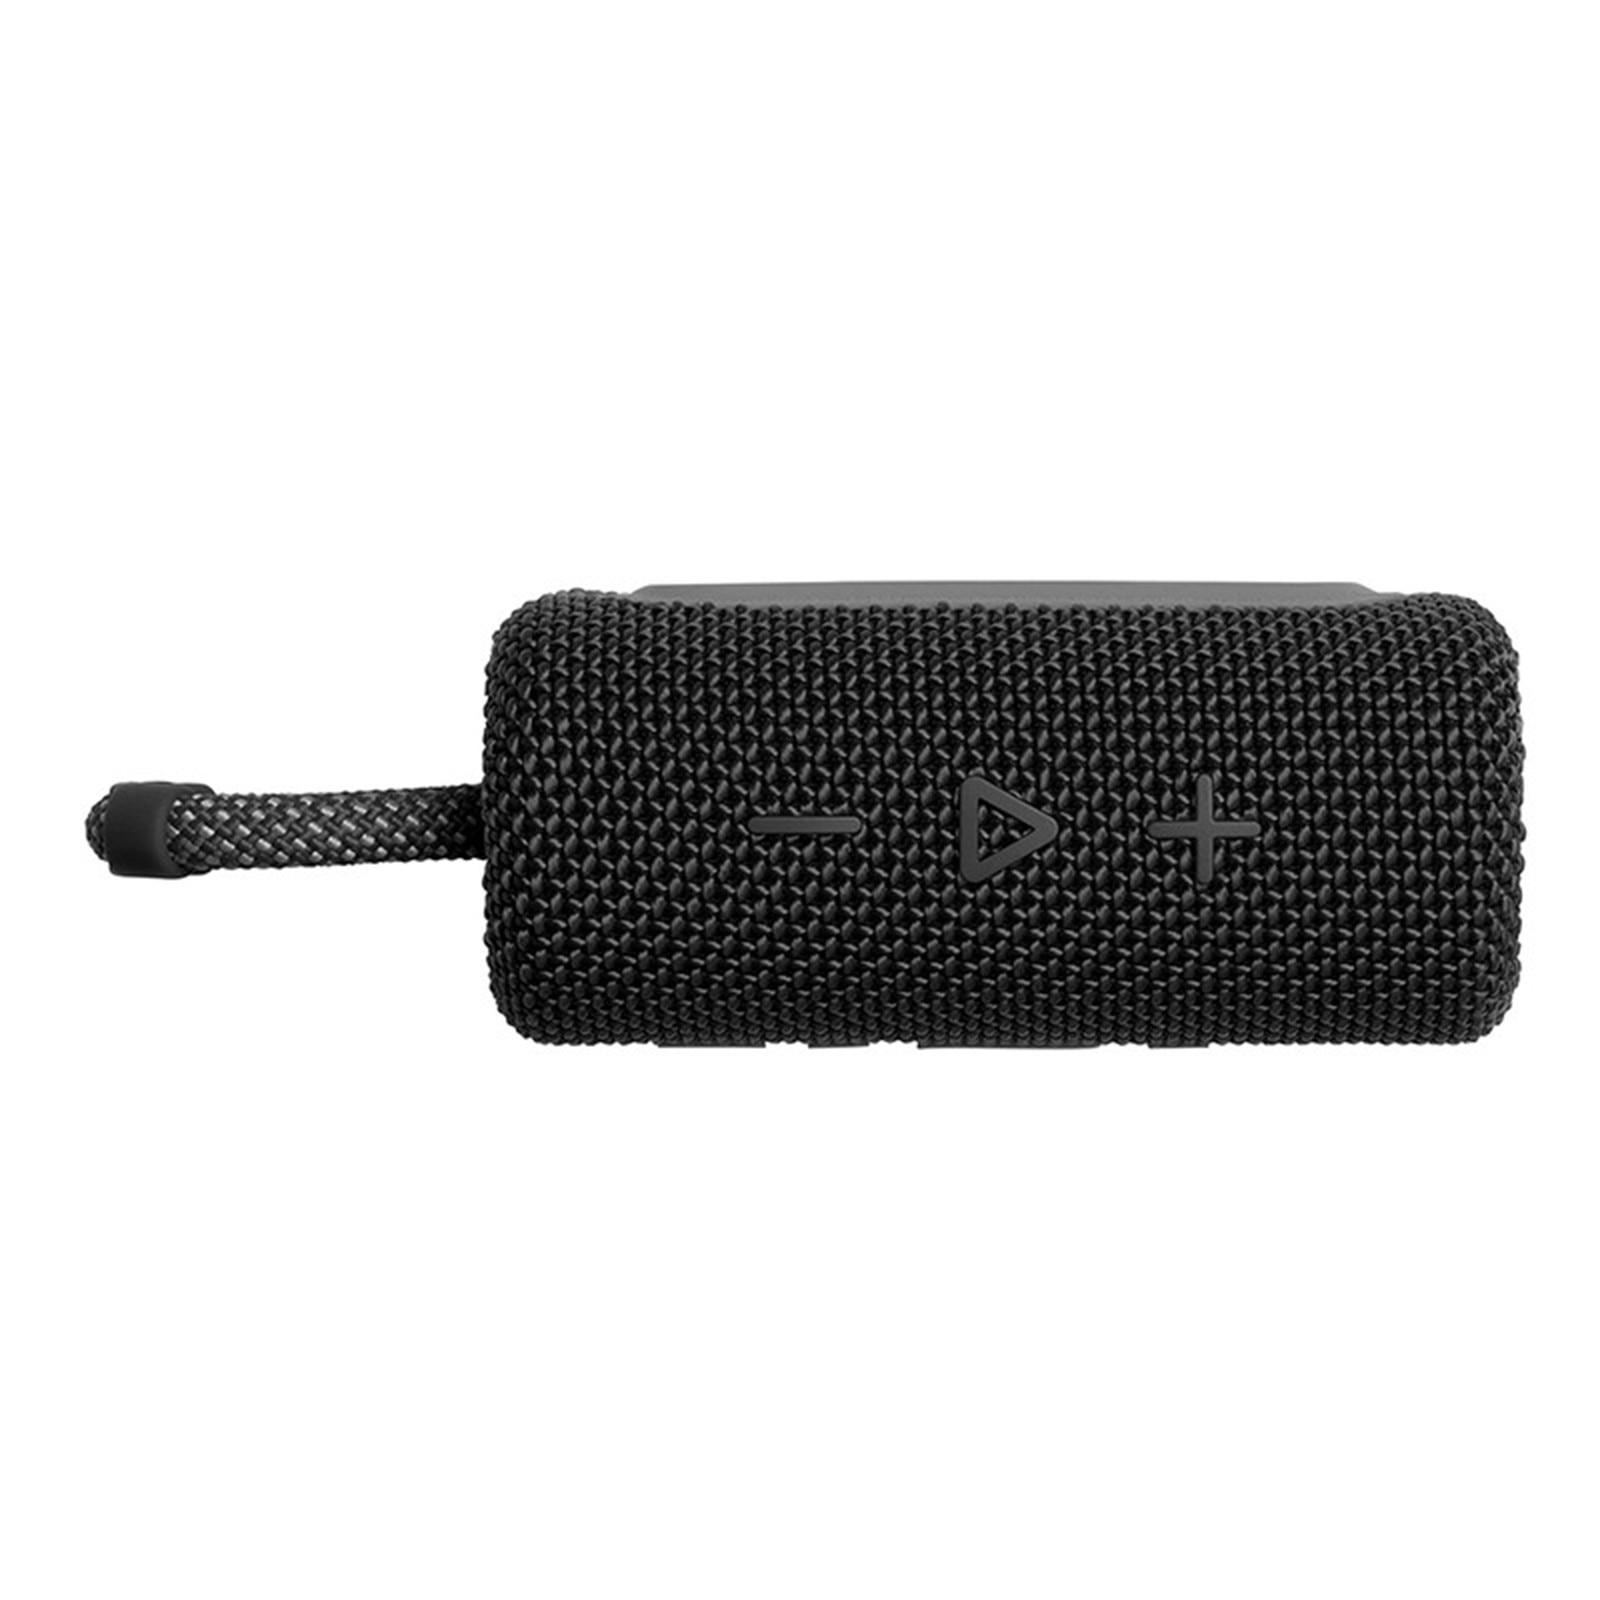 Go3 Wireless Bluetooth Speaker Subwoofer Outdoor Speaker Waterproof Bass Sound Mini Speaker Multiple Colour Loudspeaker Gift enlarge